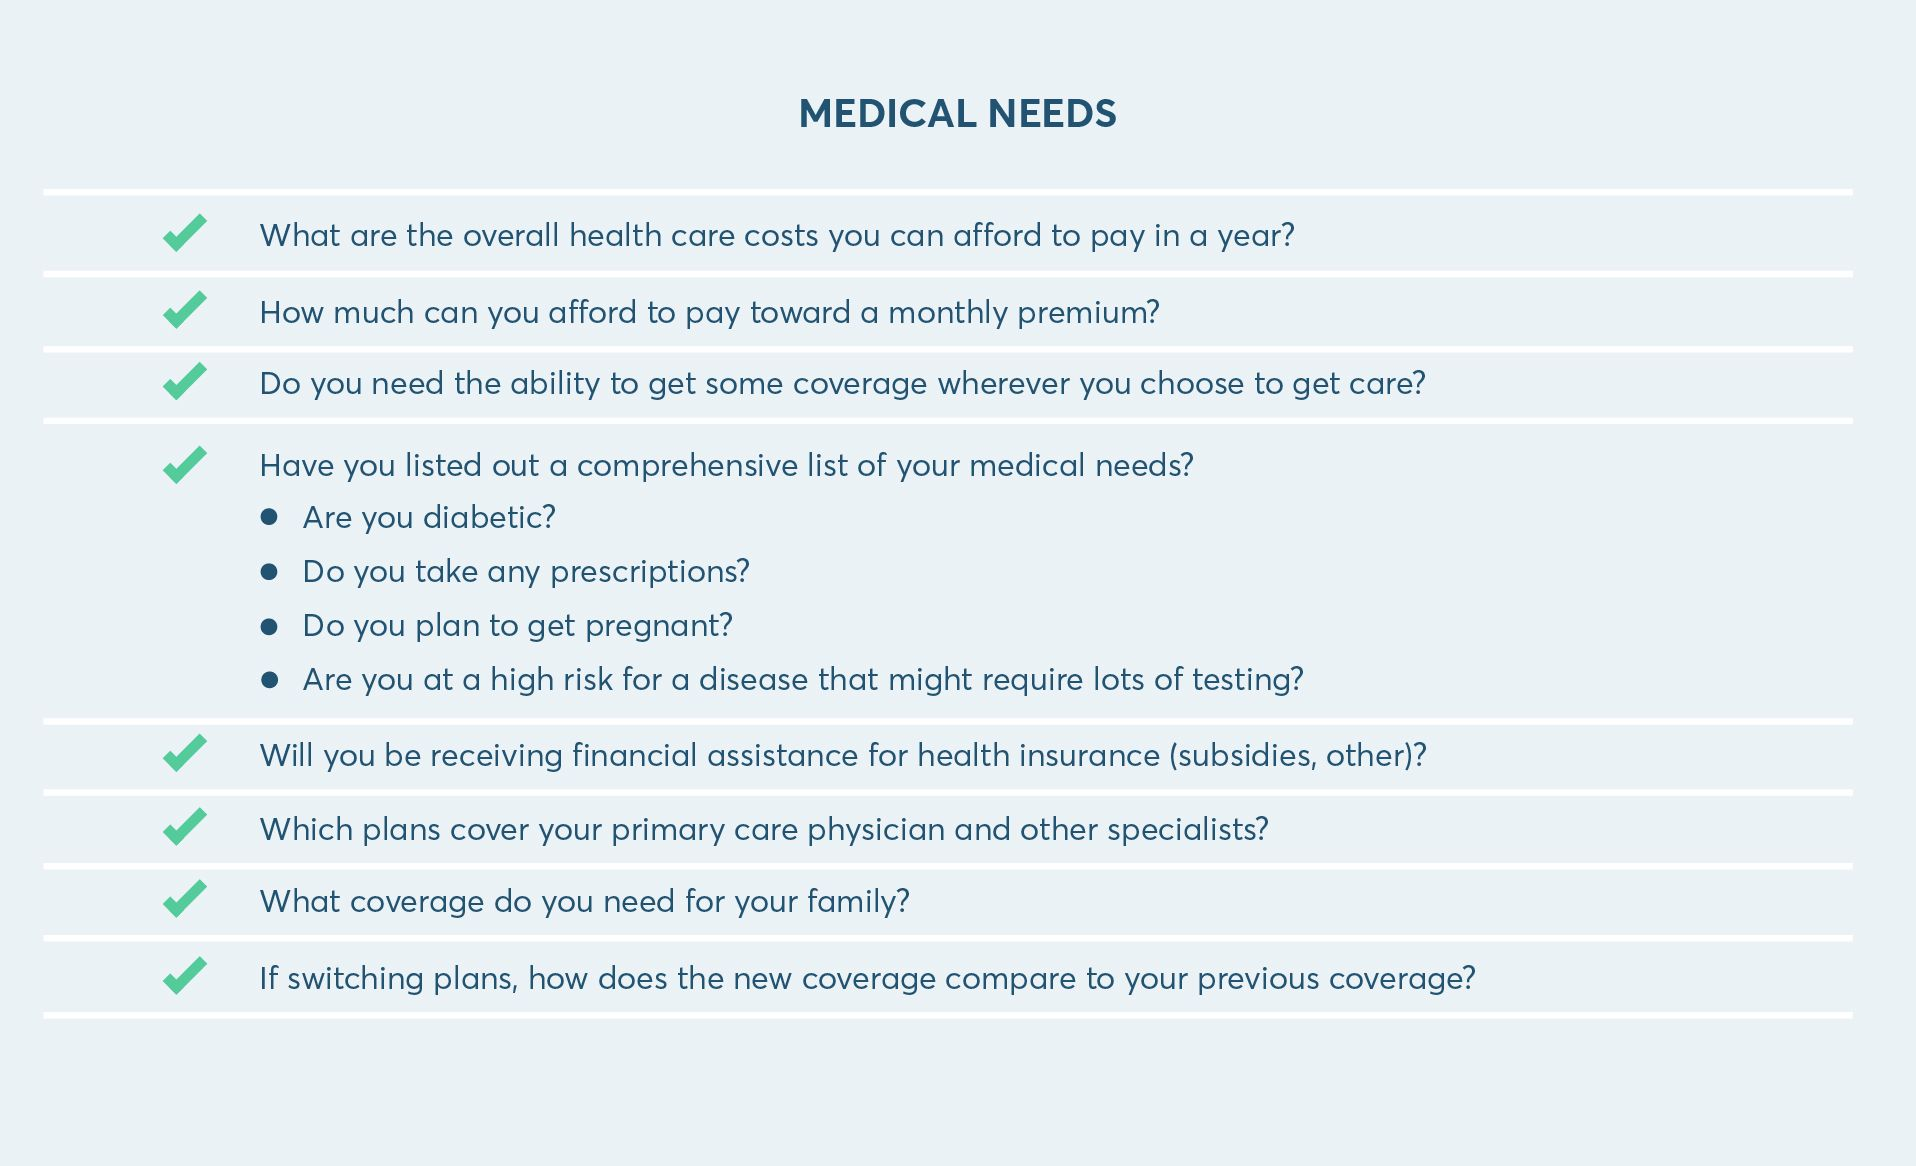 MEDICAL-NEEDS-